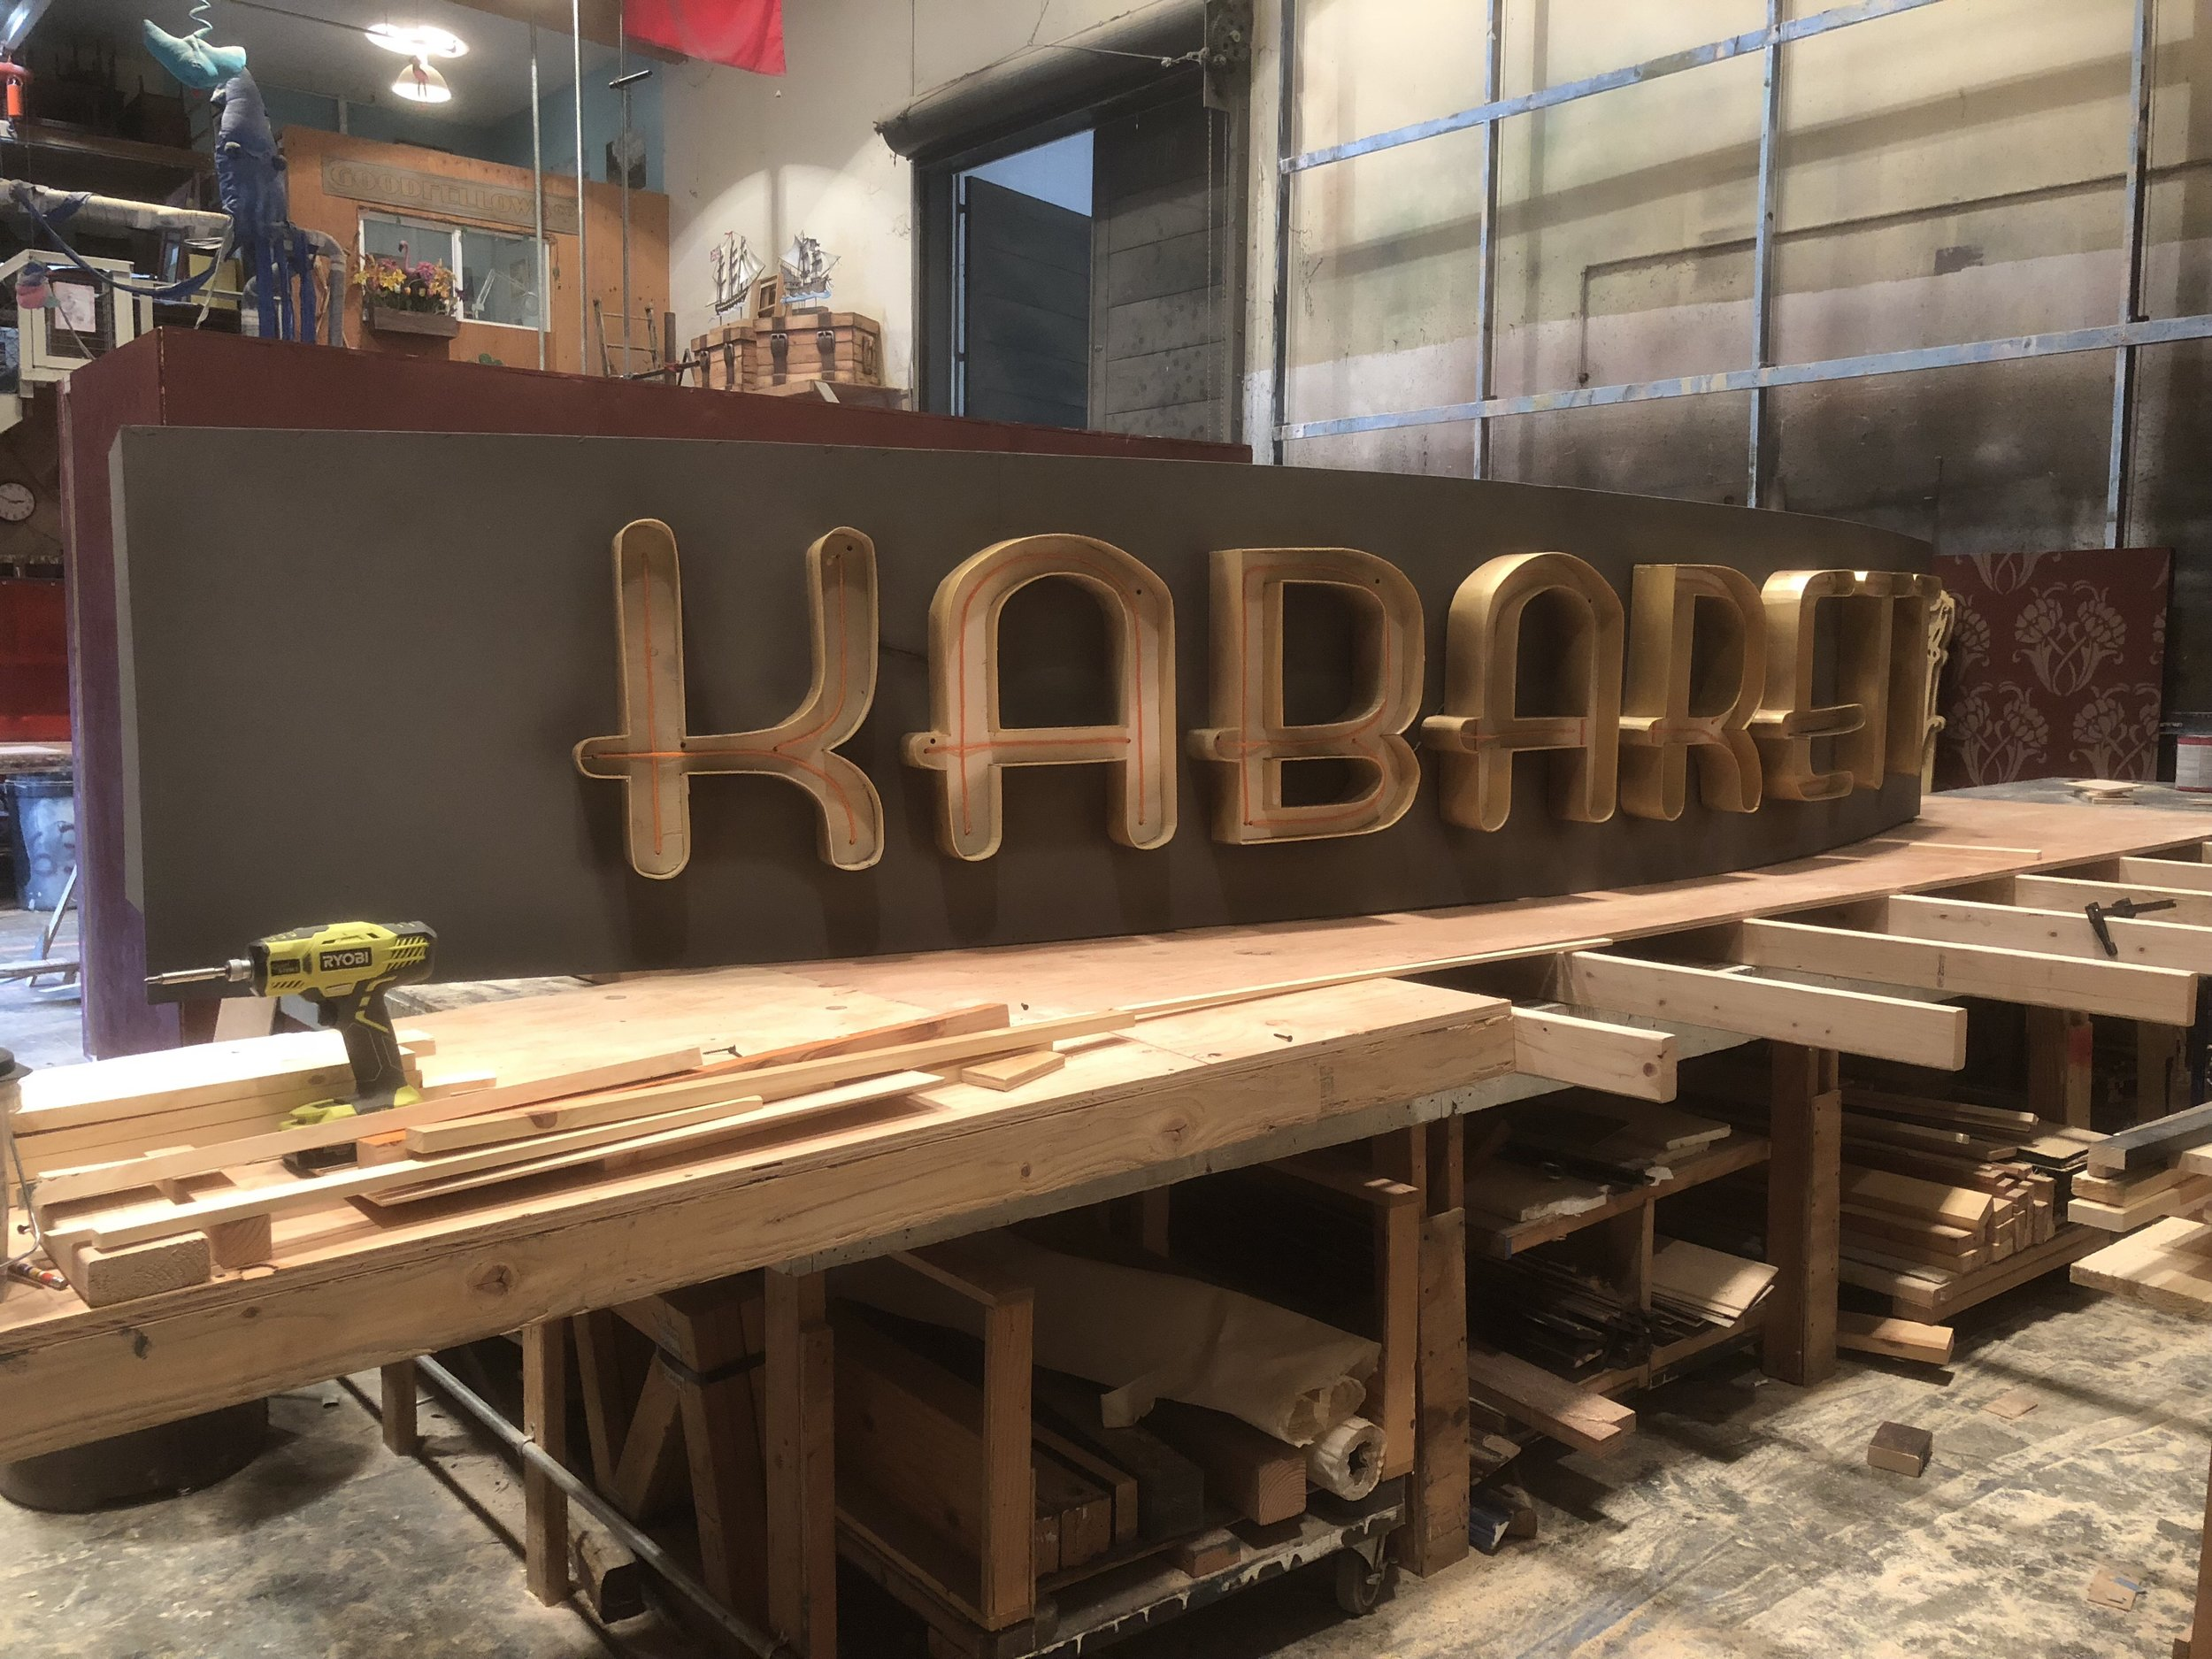 Kabaret sign